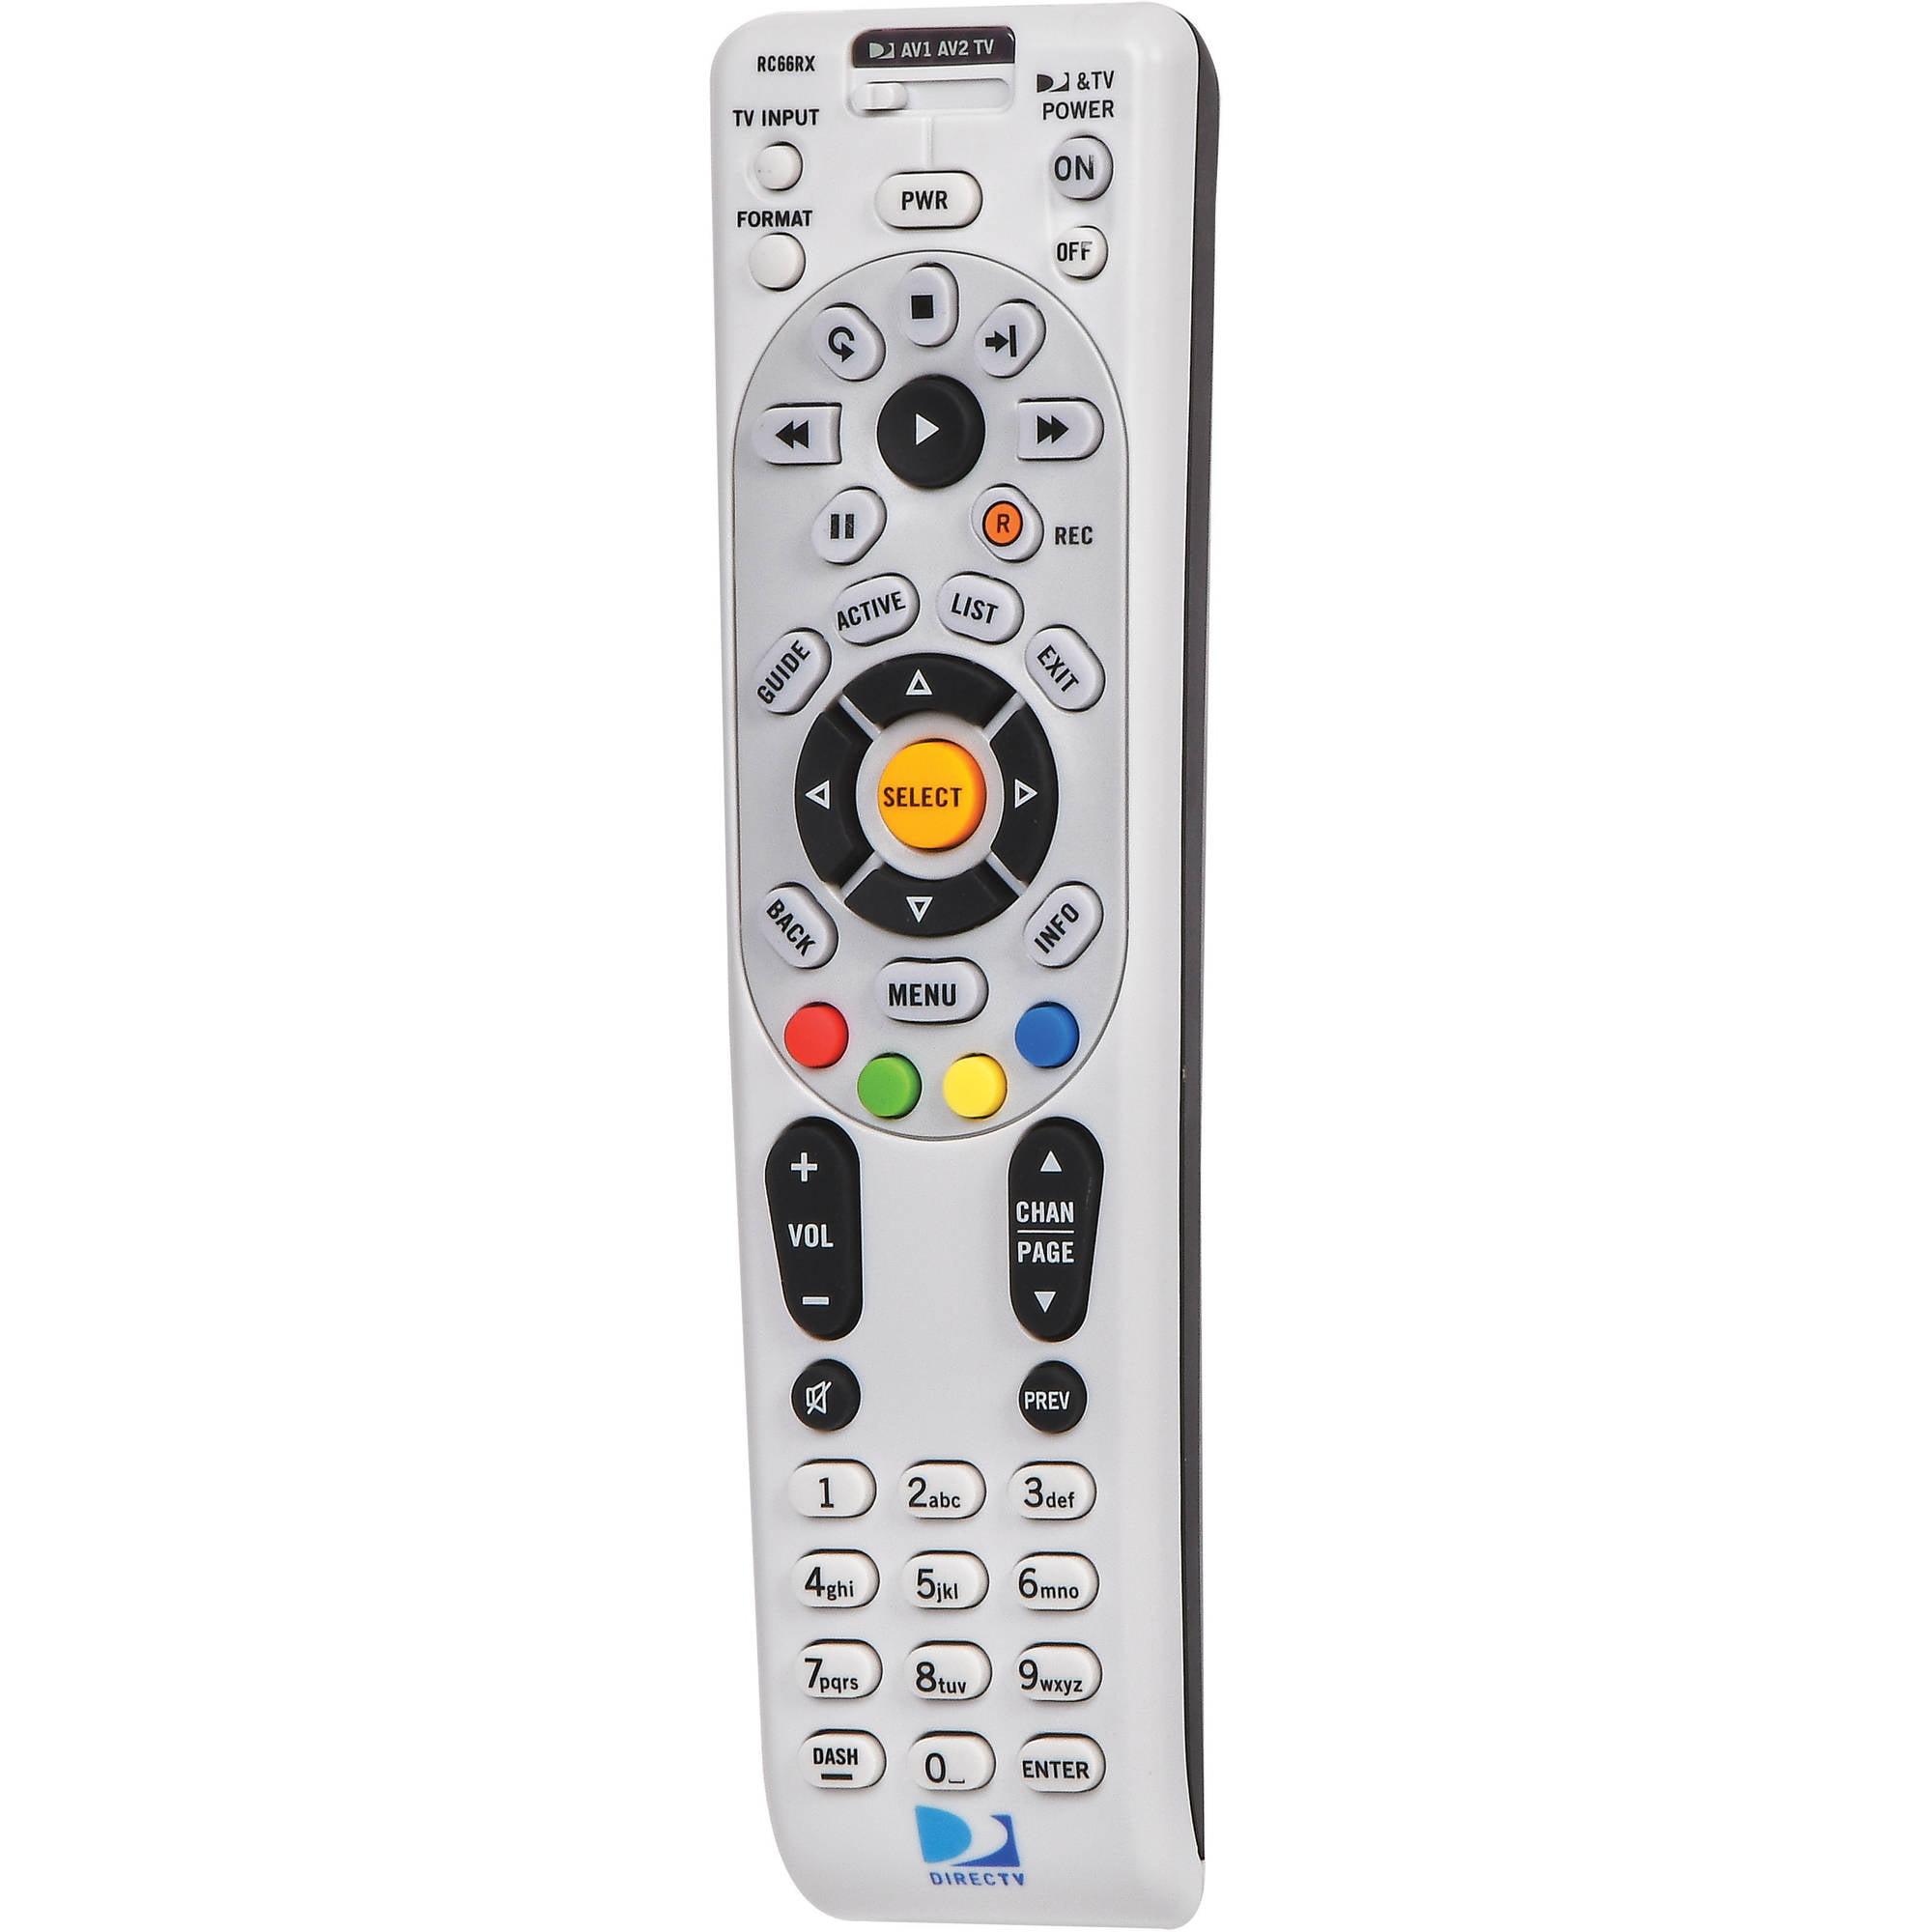 directv remote codes finest rca universal remote control setup code list digits with directv. Black Bedroom Furniture Sets. Home Design Ideas